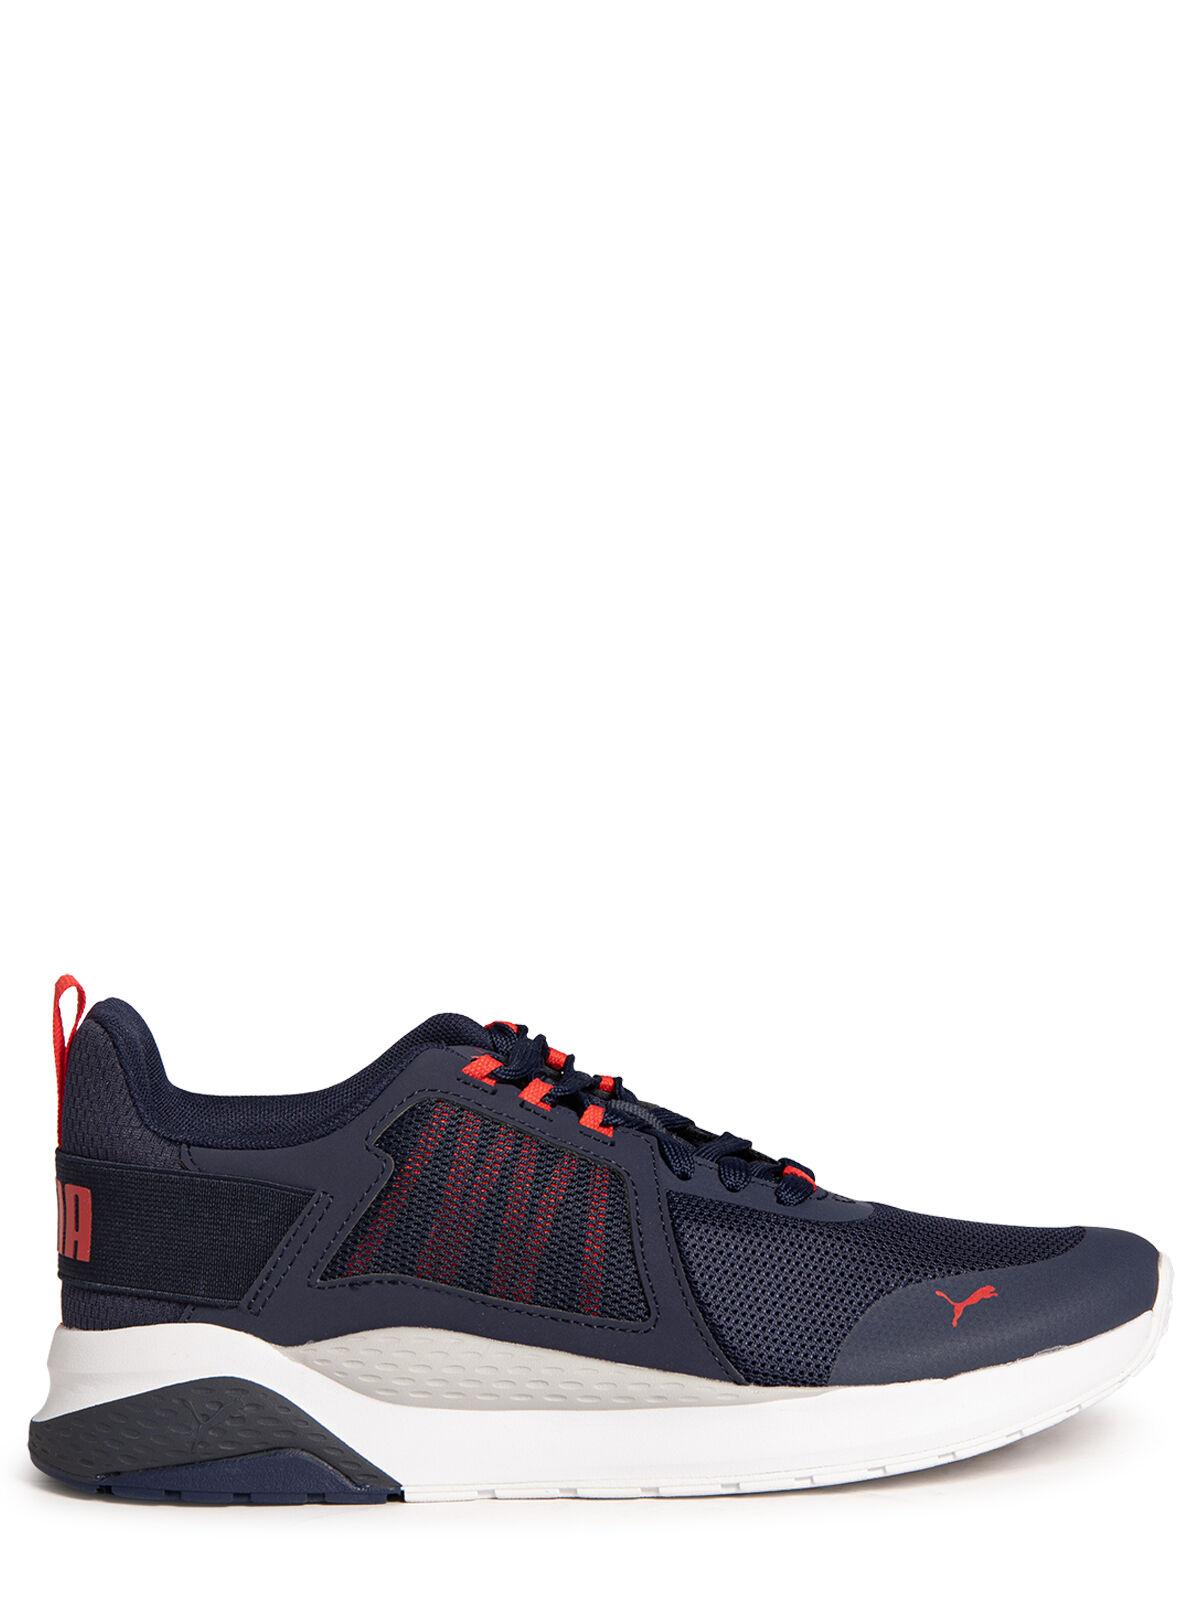 Puma Sneaker Anzarun navy | Dress-for-less